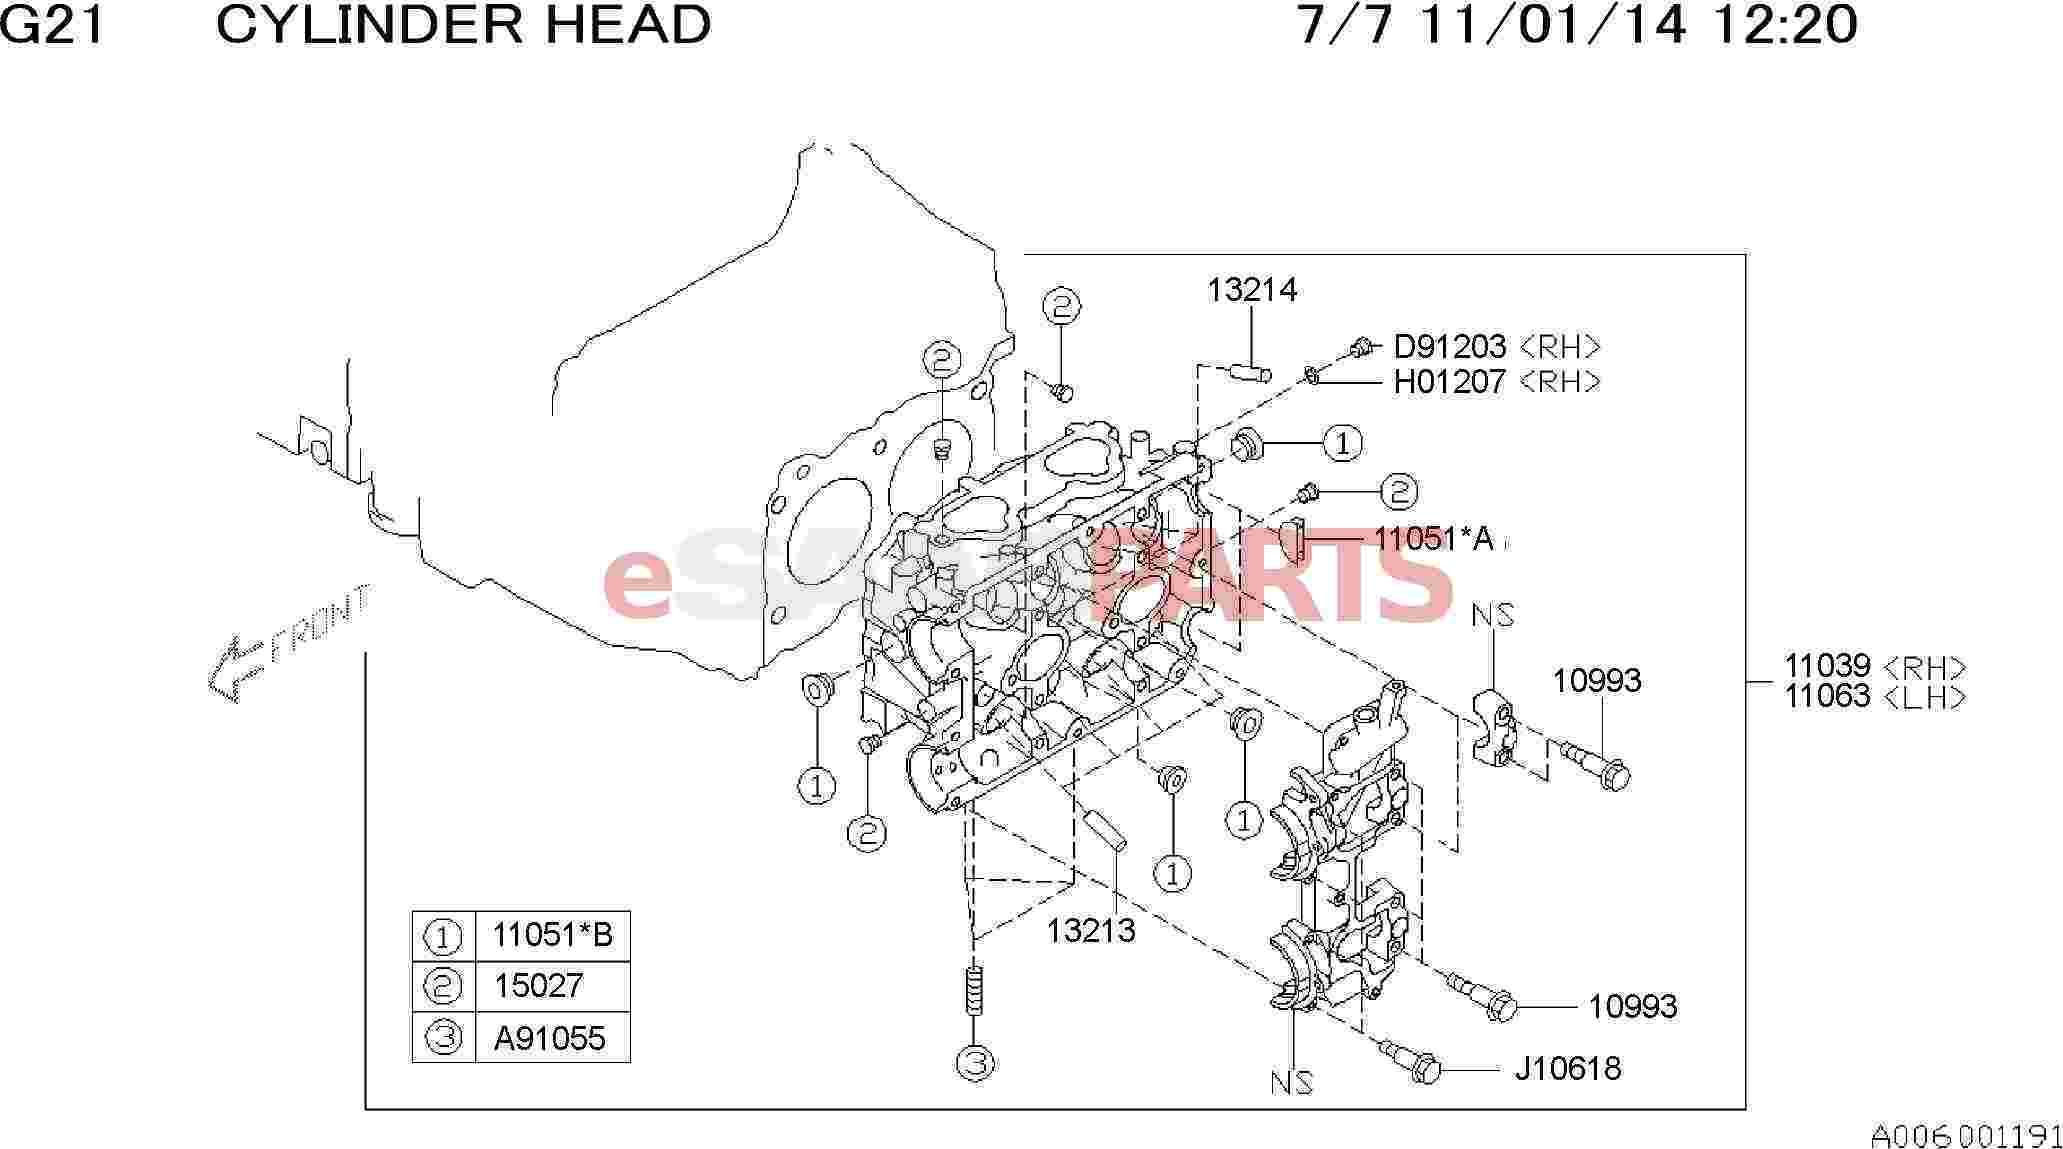 Saab Head Assembly Cylinder